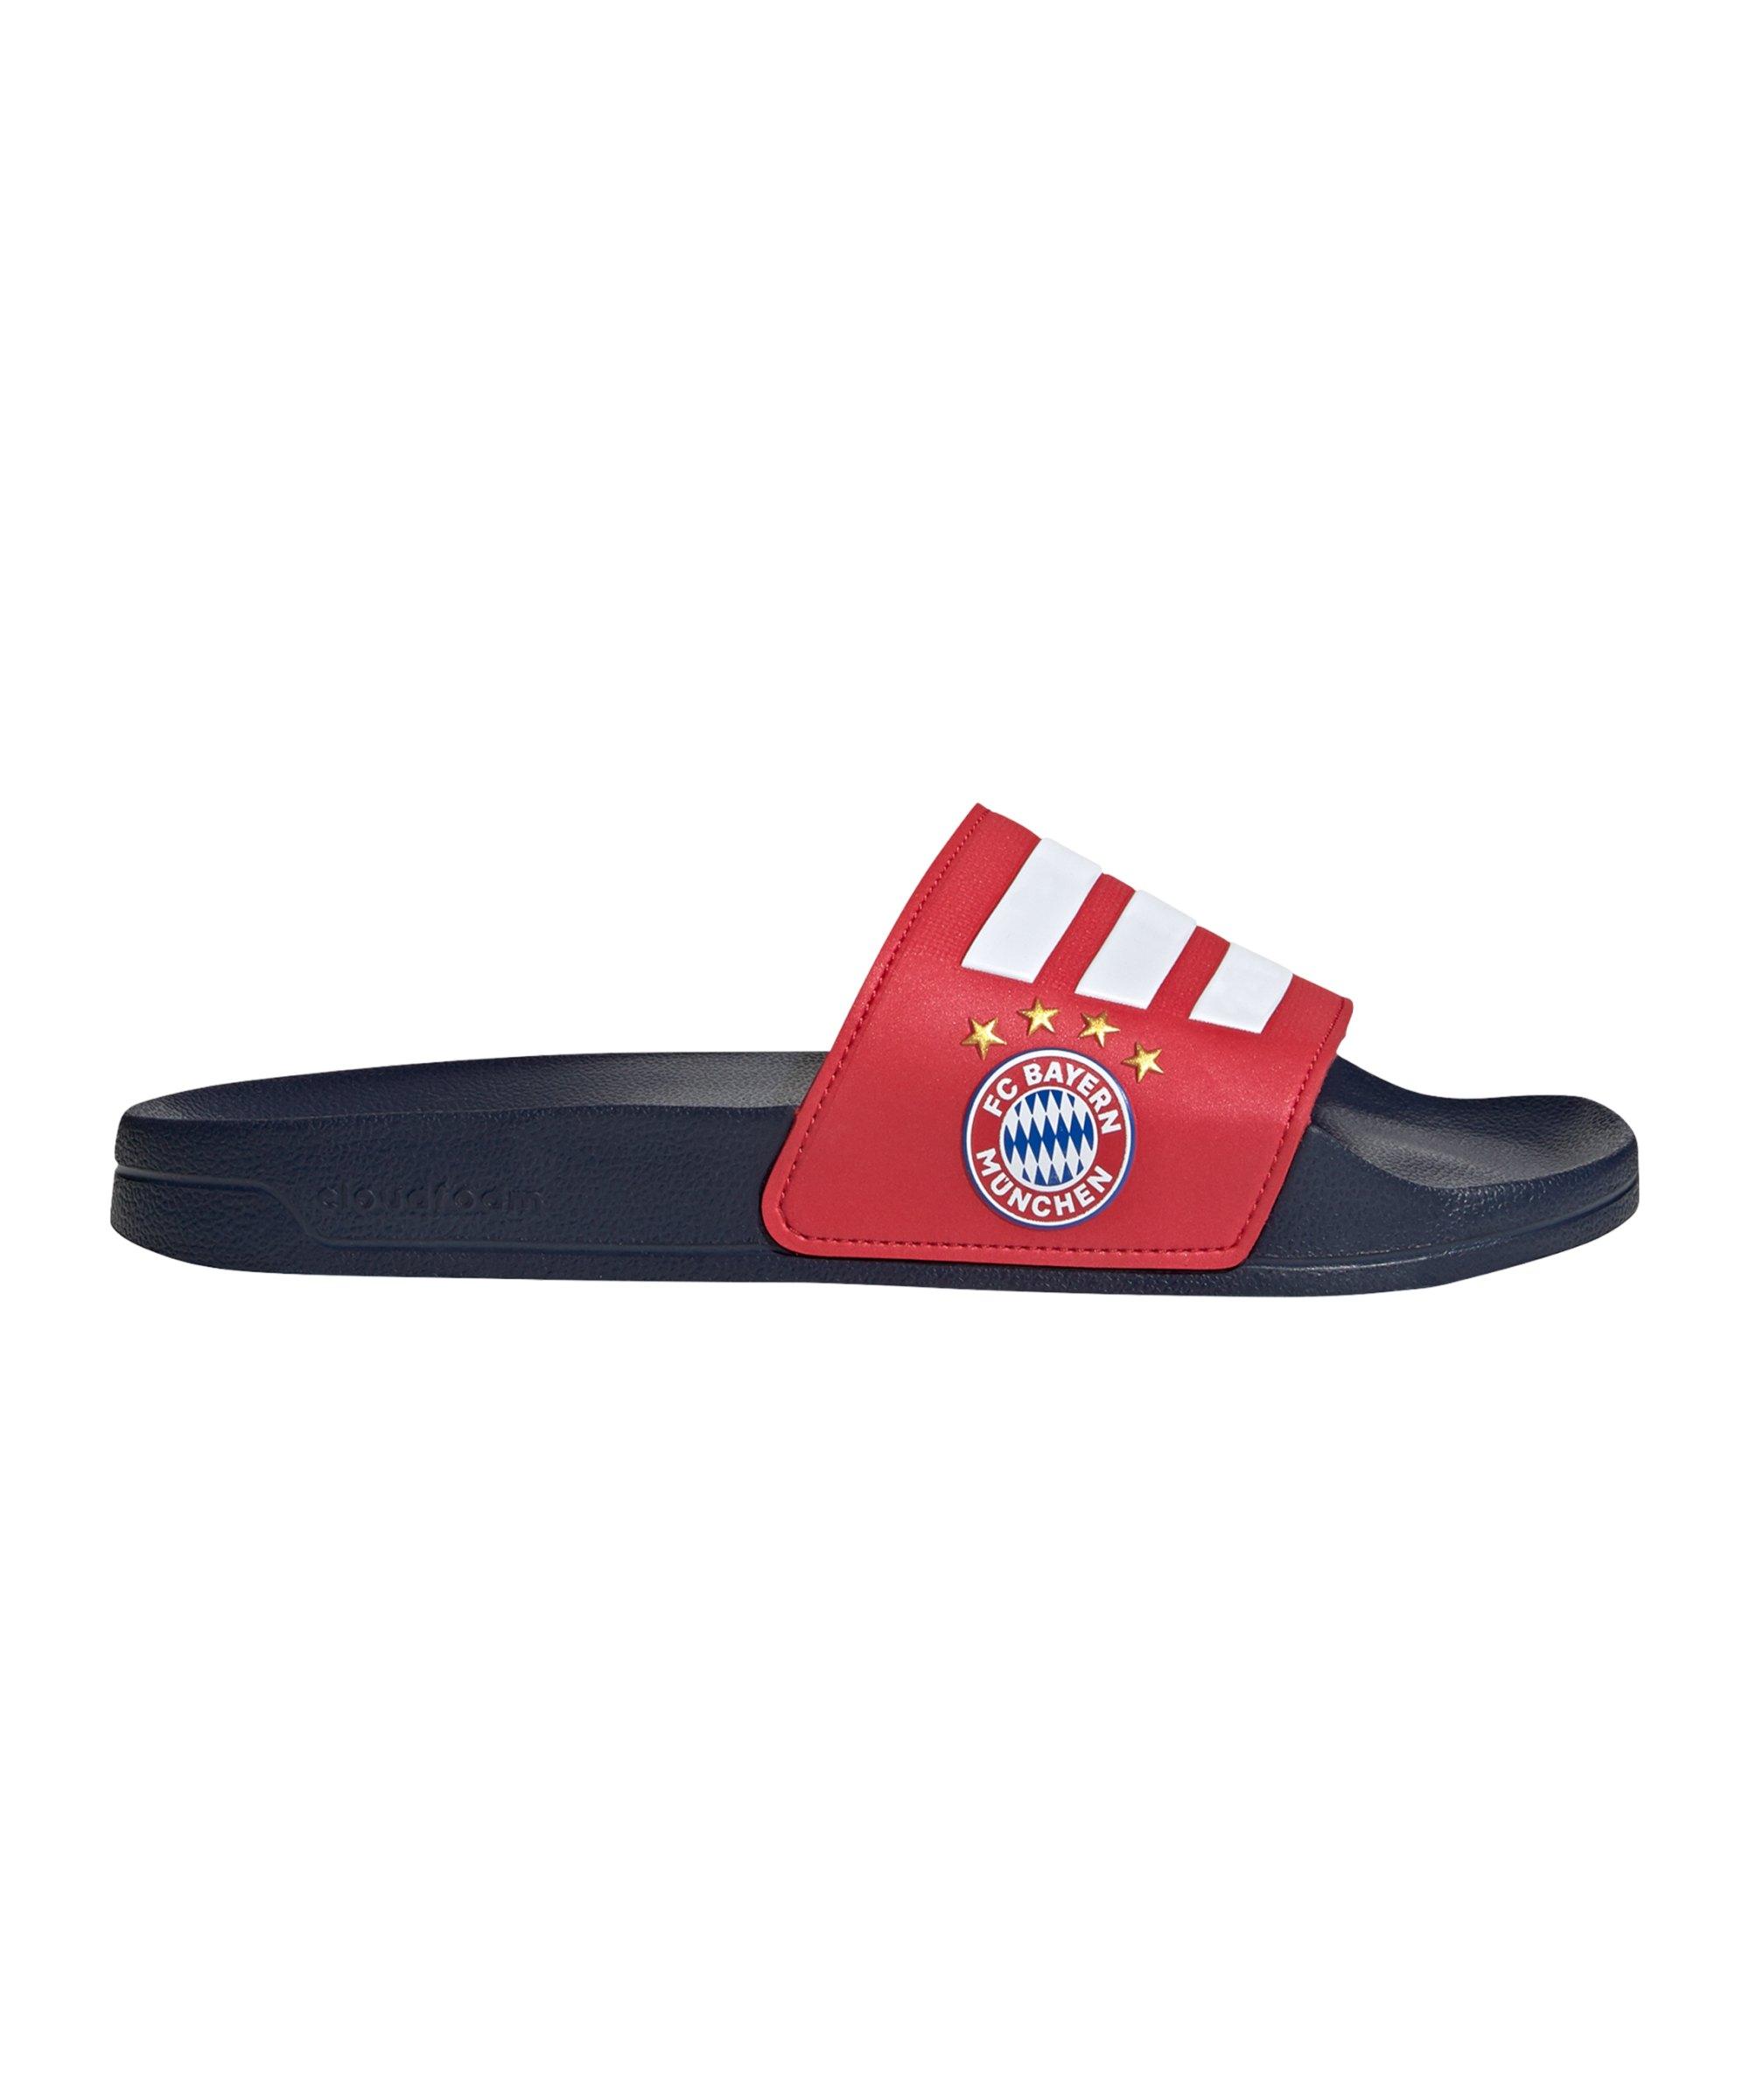 adidas Adilette Shower Badelatsche Rot Weiss Blau - rot